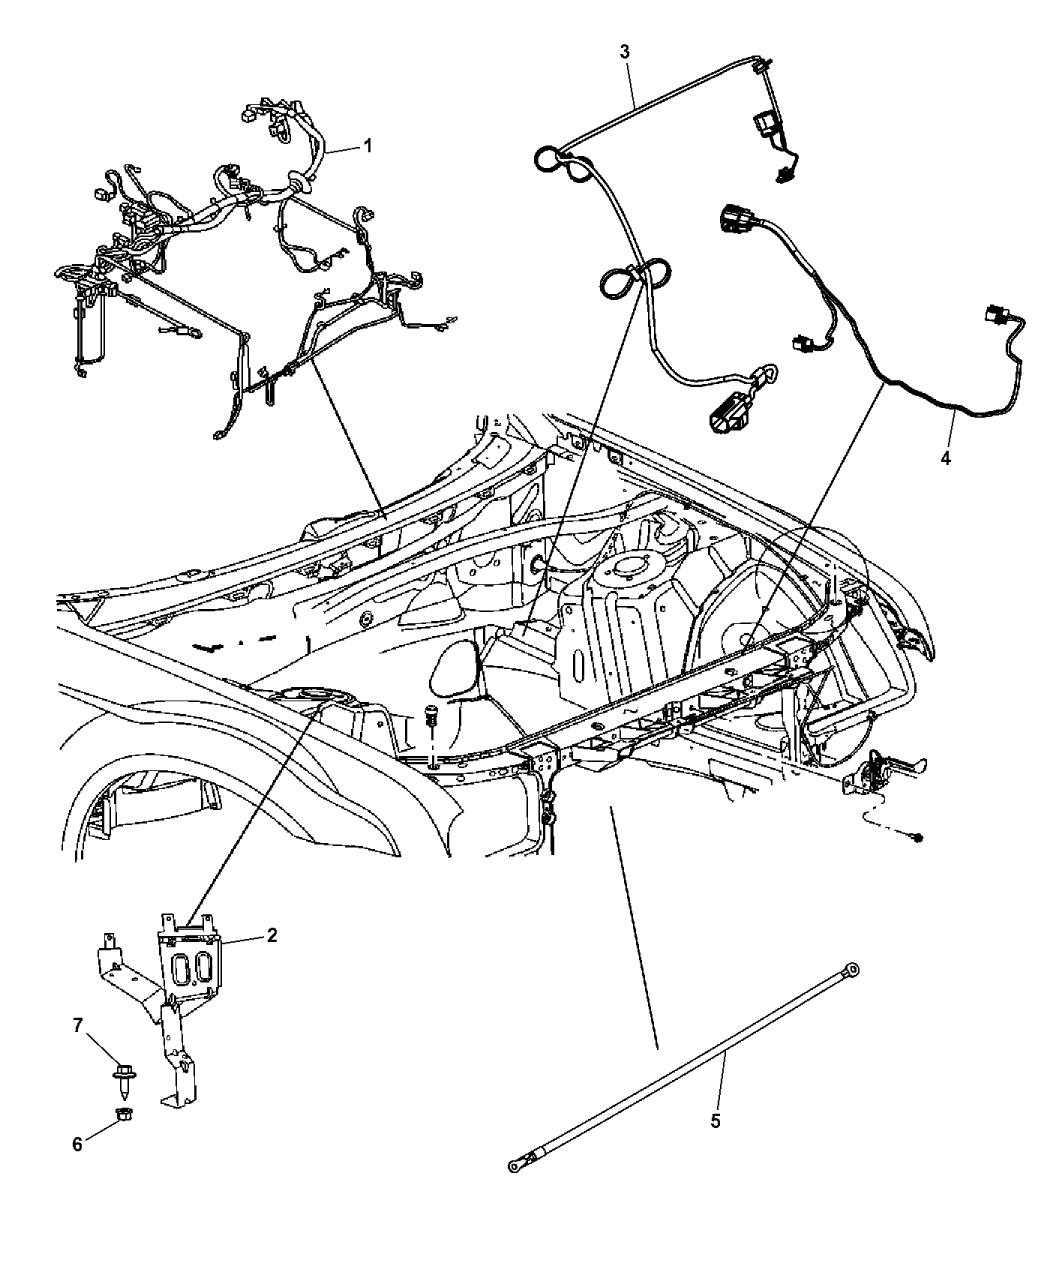 Chrysler 300 Parts Diagram Power Distribution